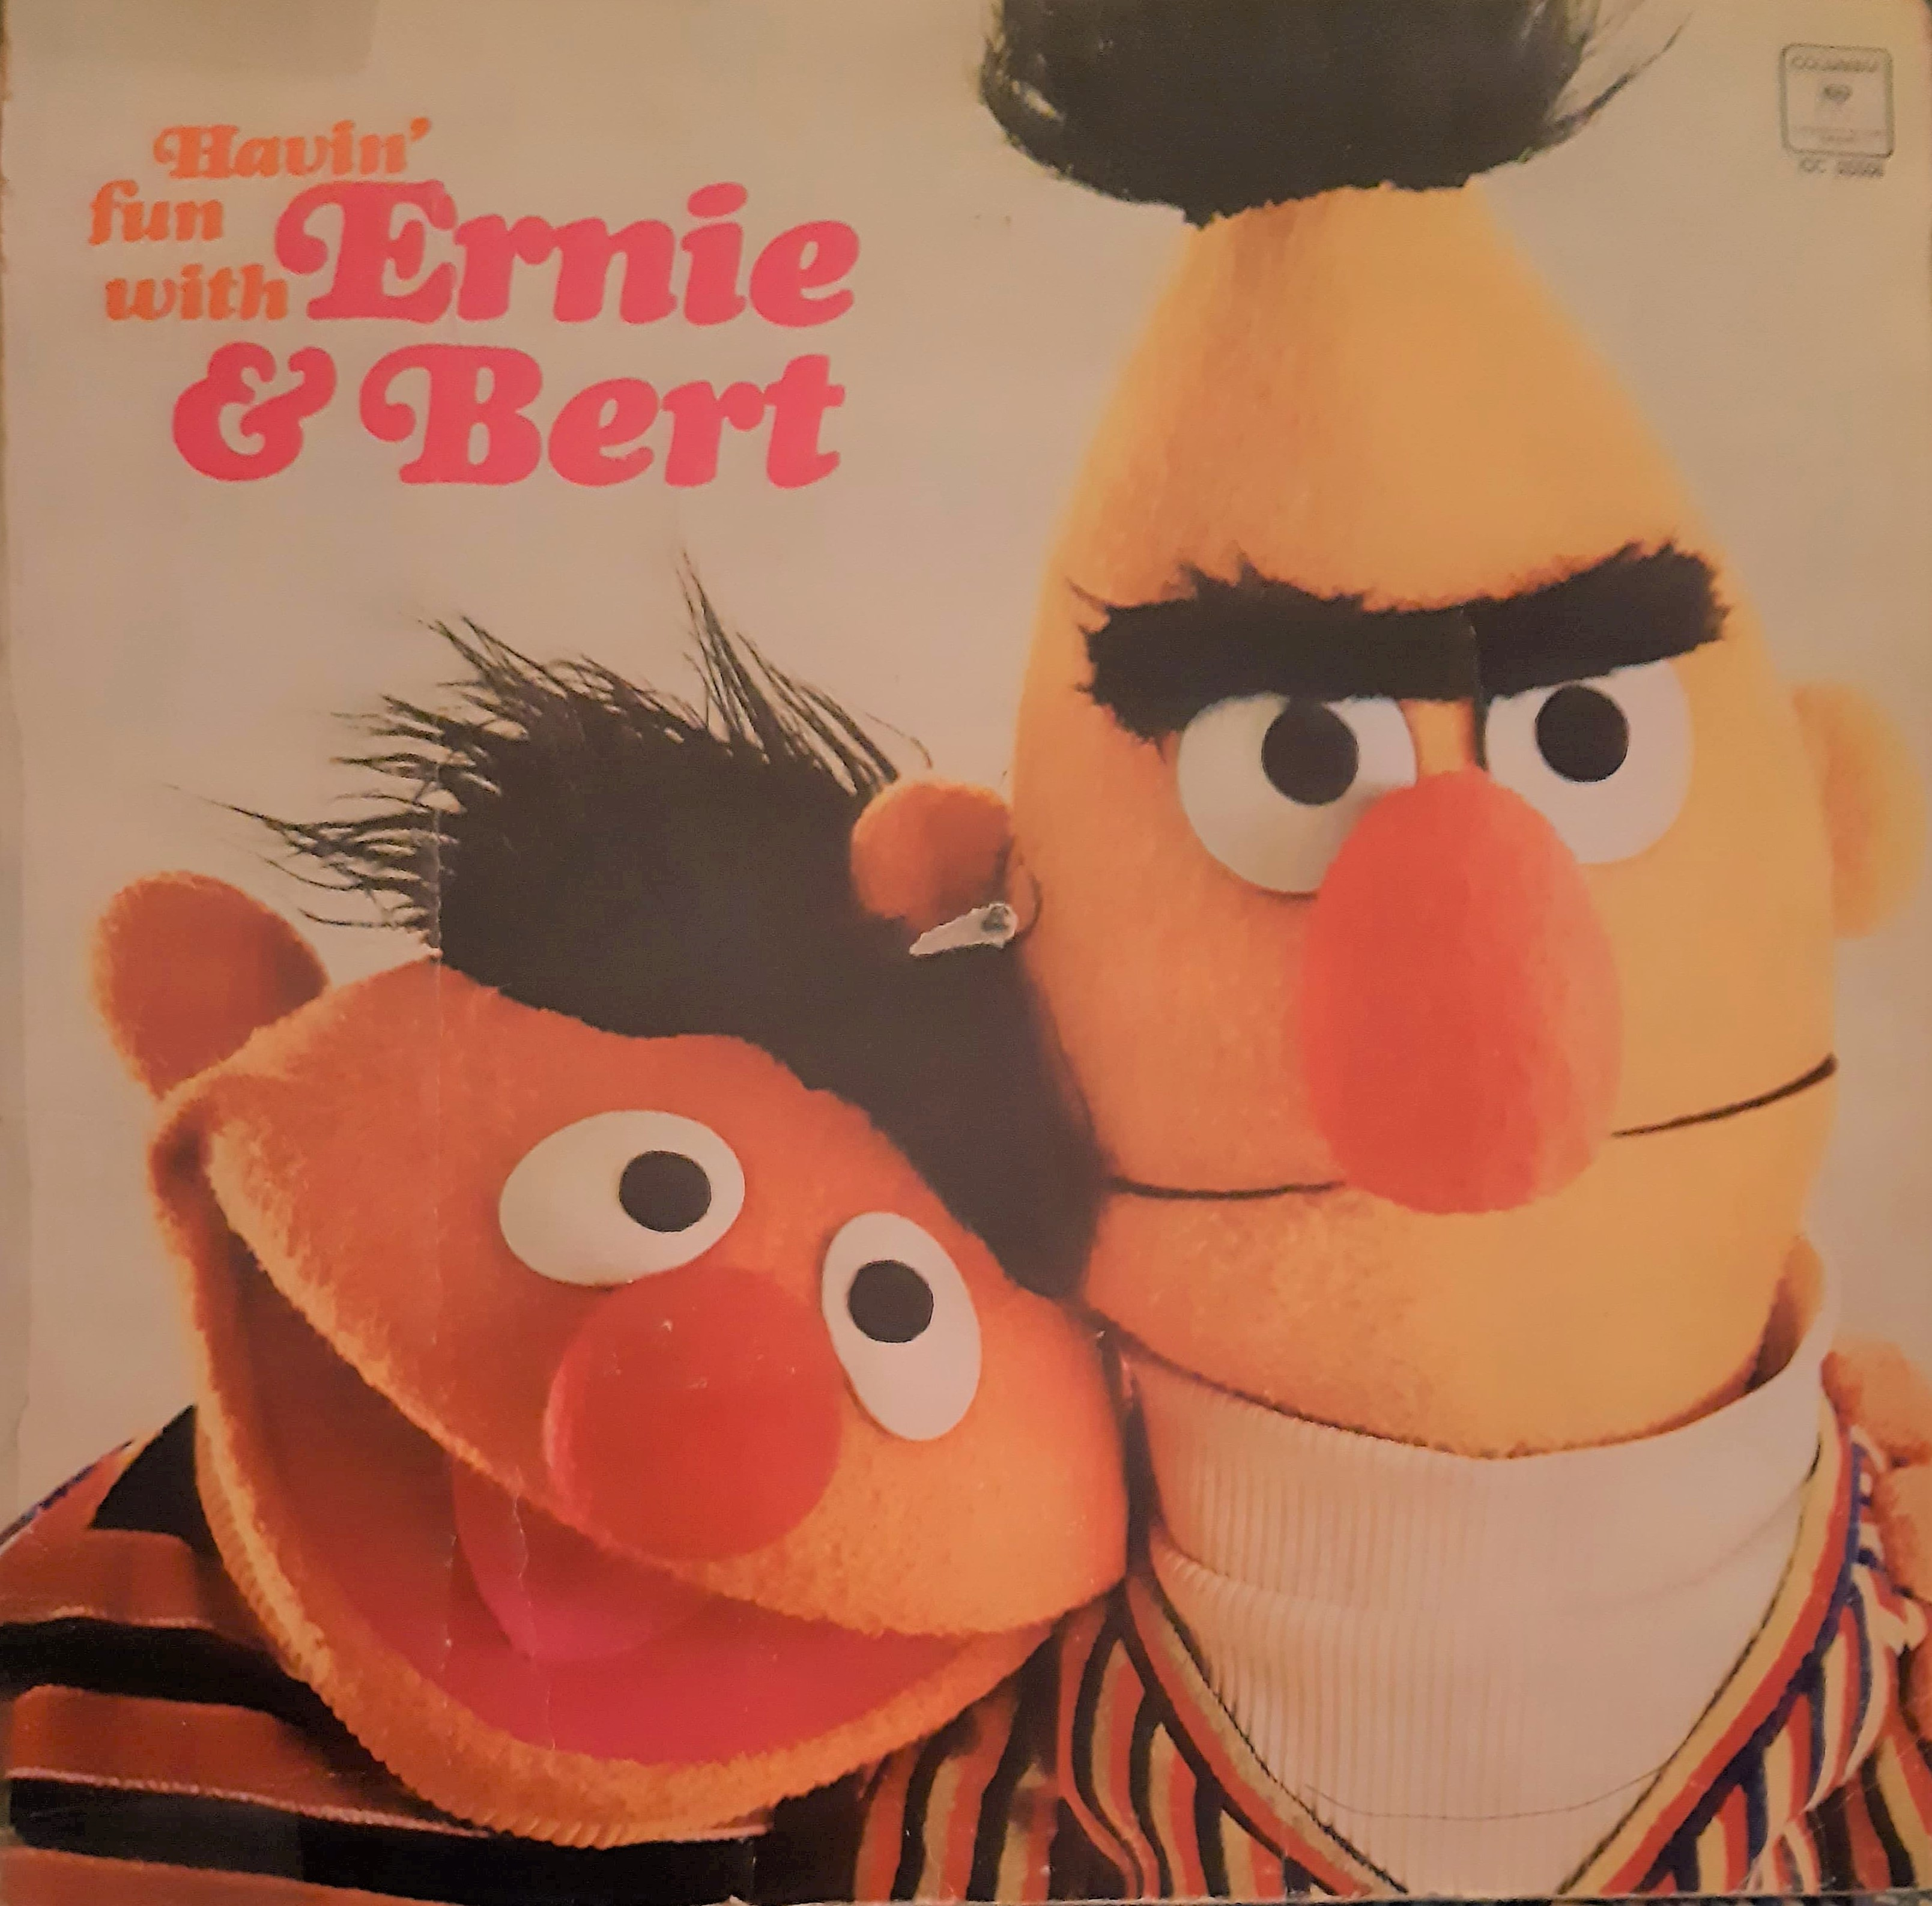 Having Fun with Bert and Ernie